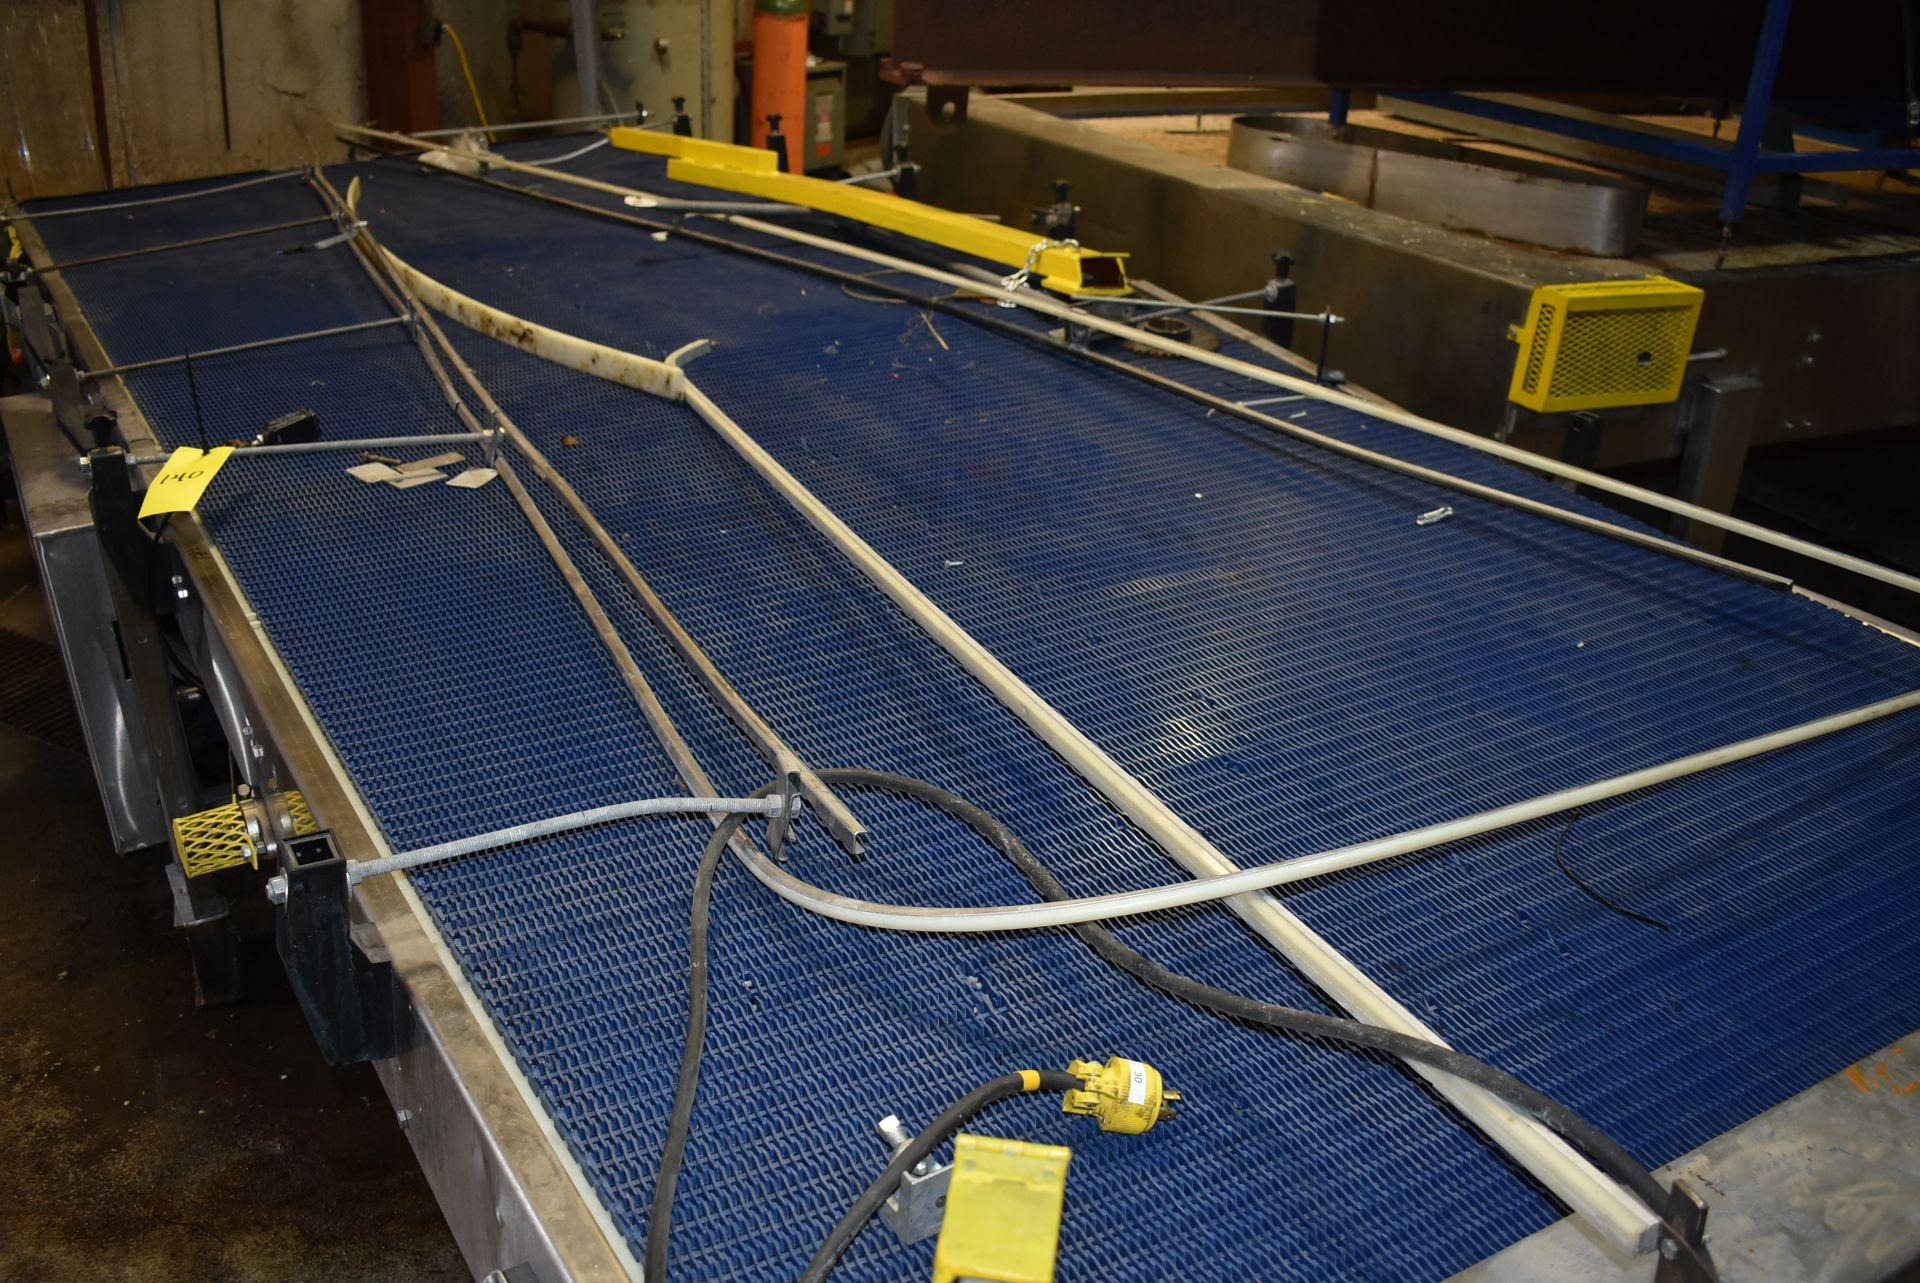 Motorized Belt Conveyor/Accumulation Table, 20' x 6' - Image 2 of 2